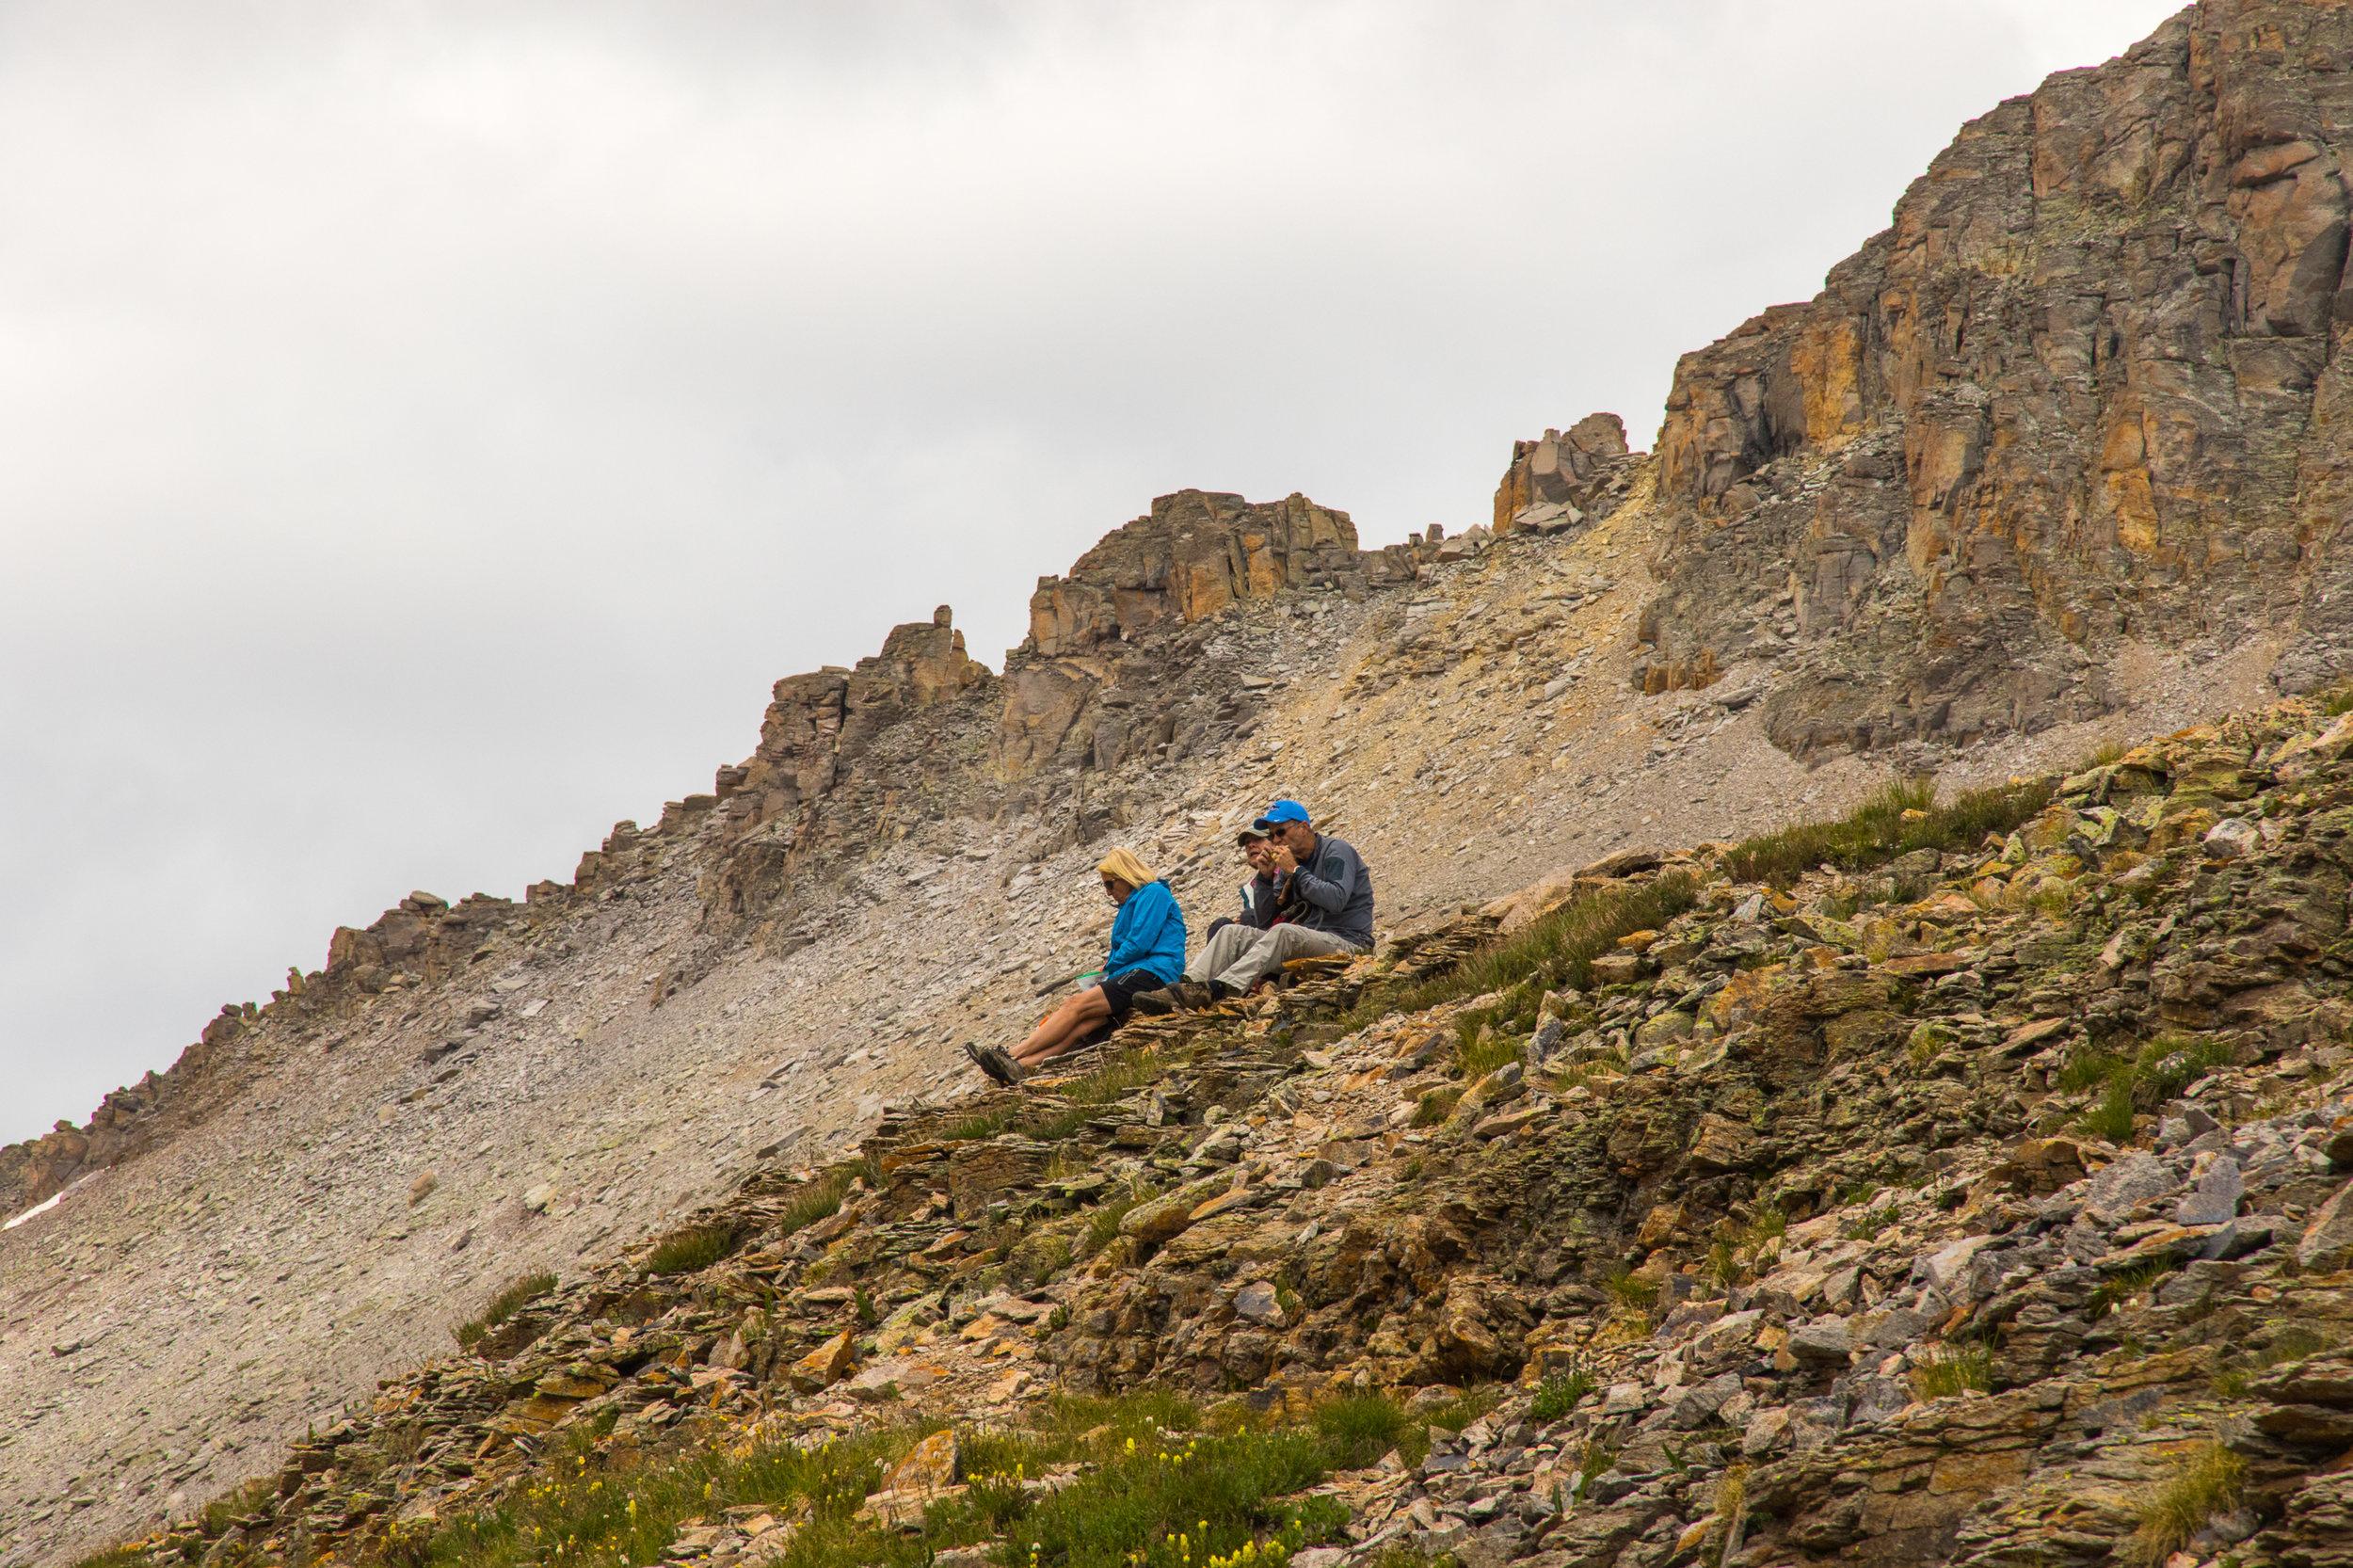 Tim, Angela & Mary enjoy the lunch spot overlooking Columbine Lake